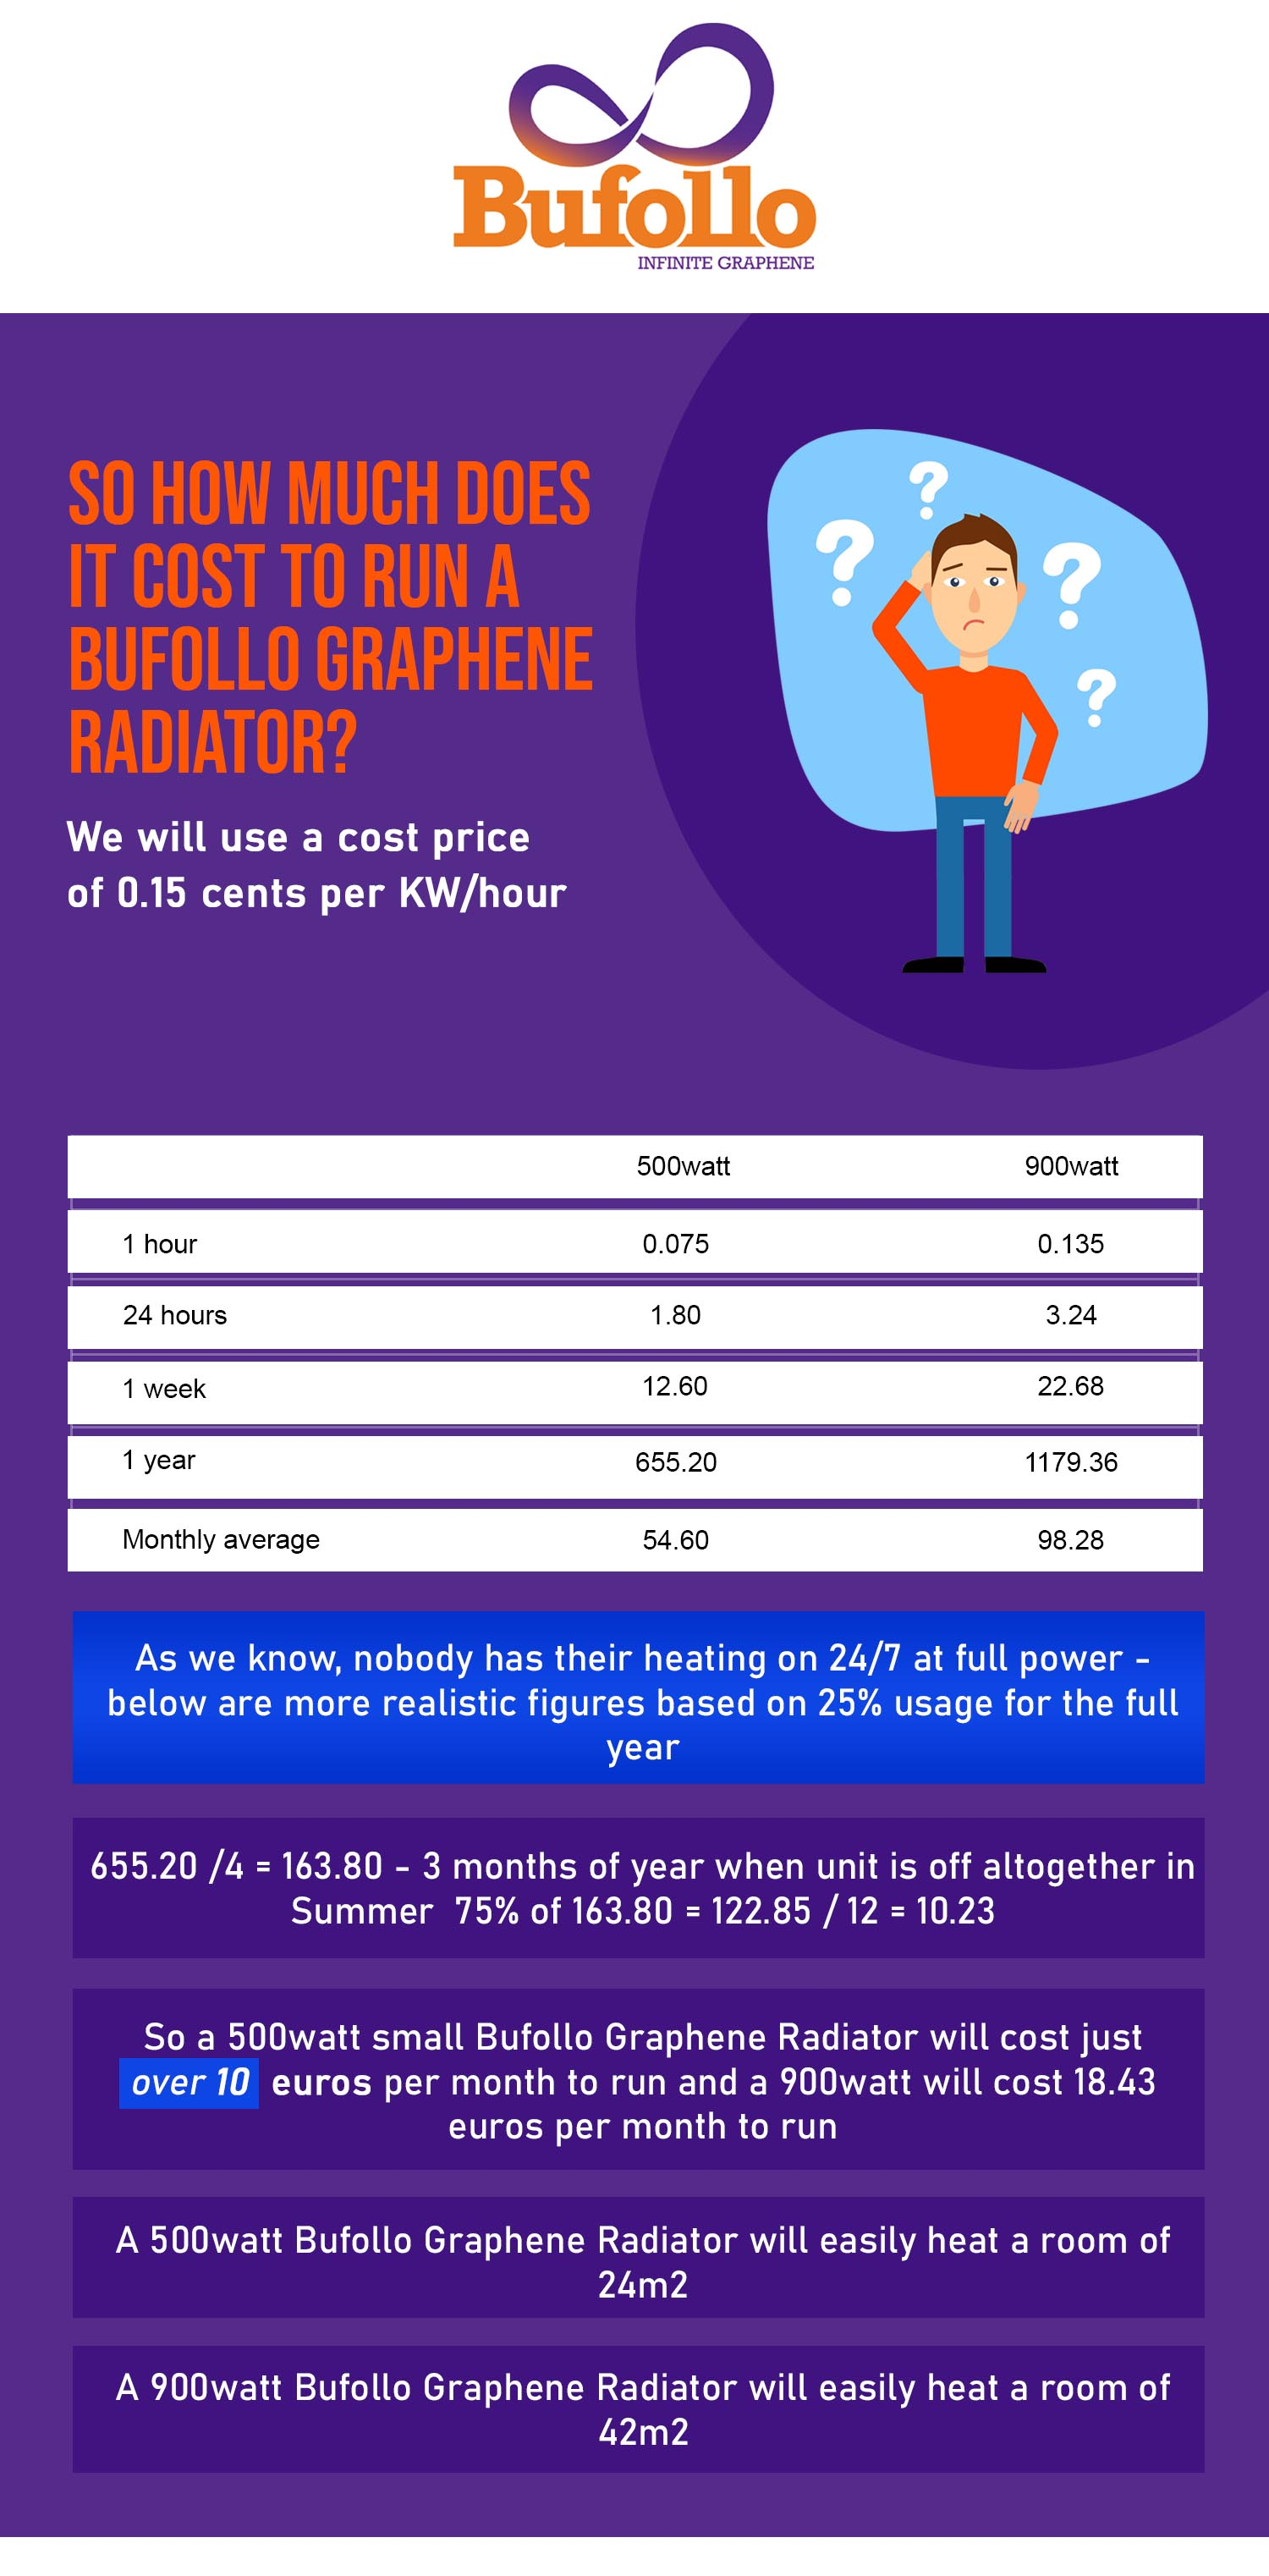 cost to run a bufollo graphene radiators